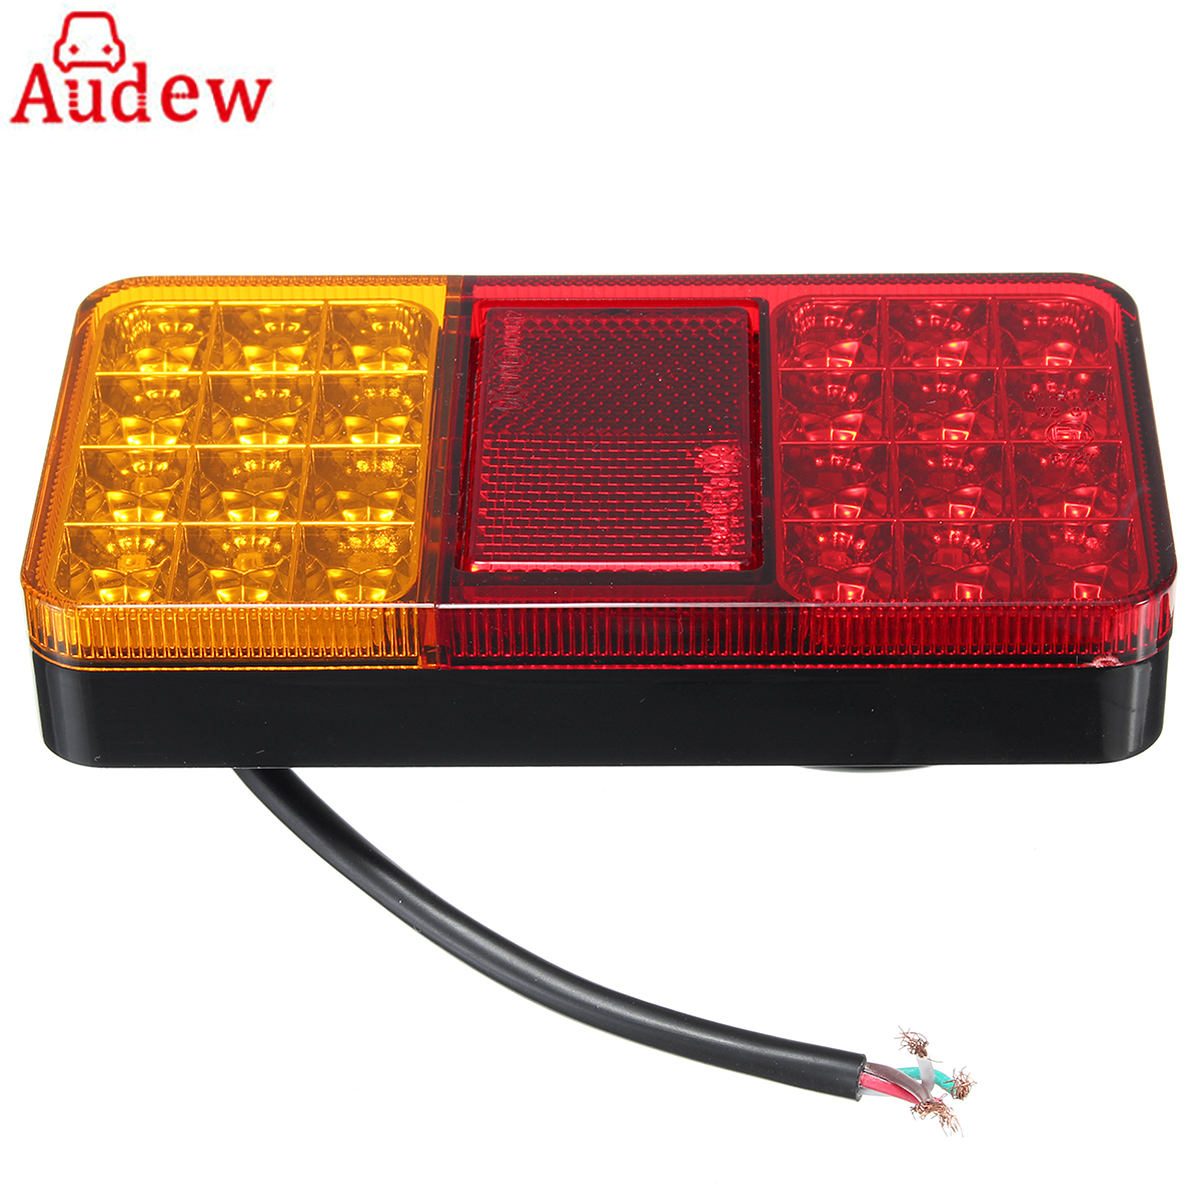 24LED 12 V Remolques trasero luces de freno detener cola turn indicador Lámparas LED para coche Remolques s camiones UTEs barcos